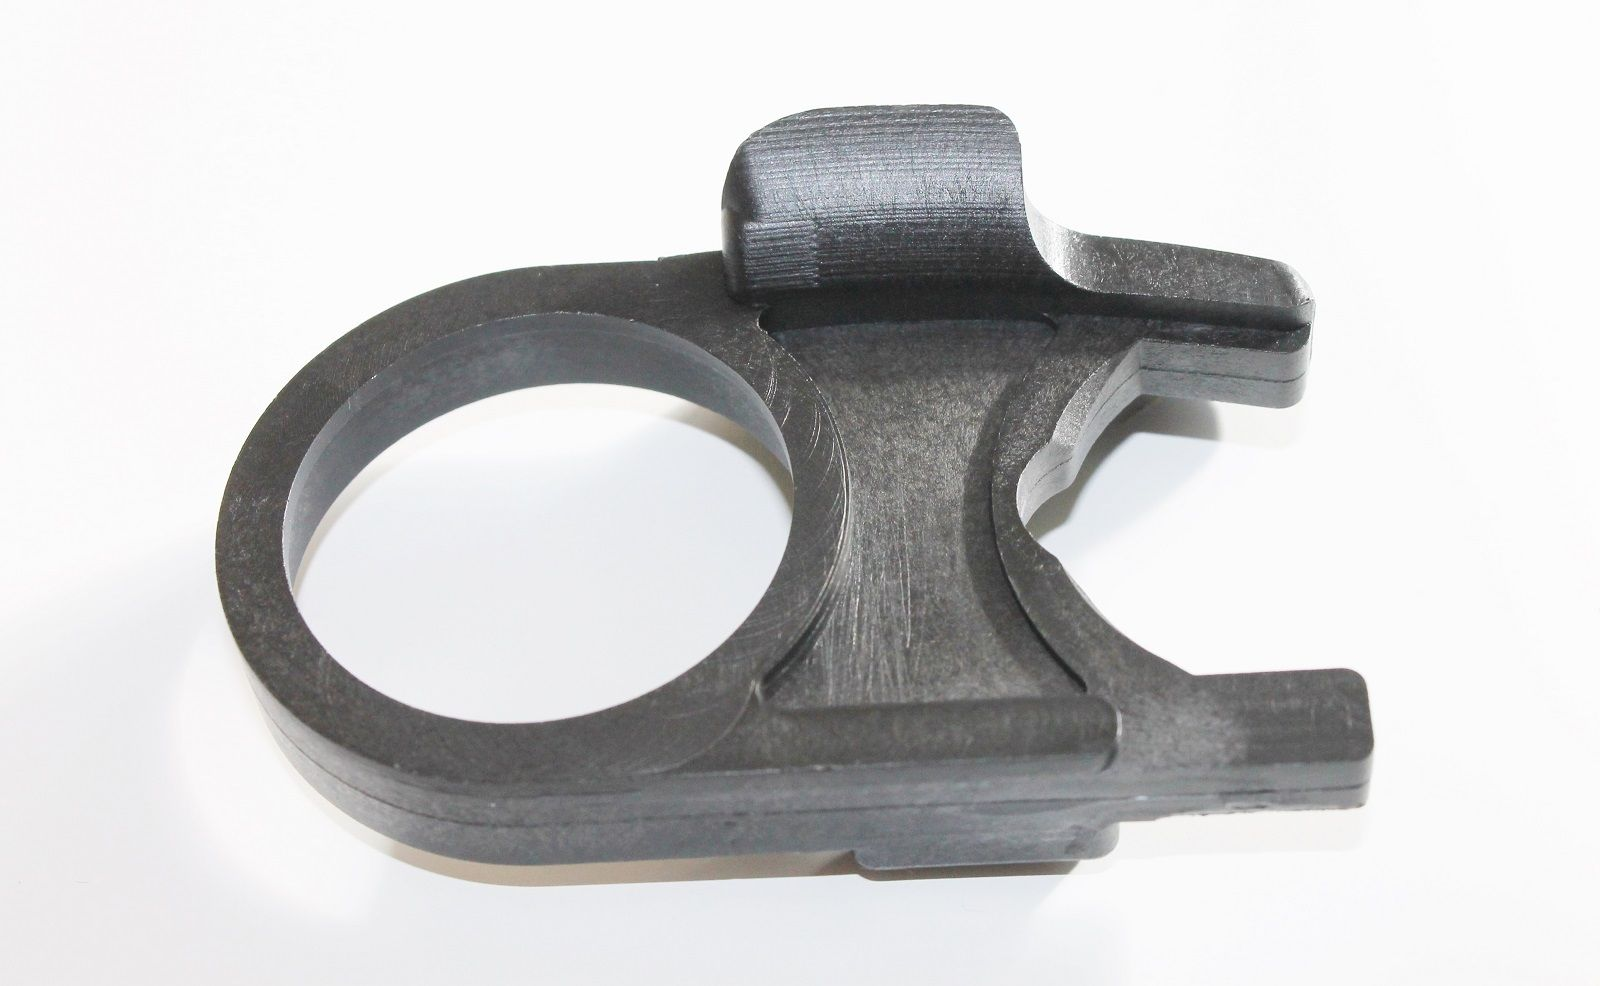 Zündapp 2x Gabel Simmerring 30x40x8  529-12.142 KS 50 Sport Typ 530